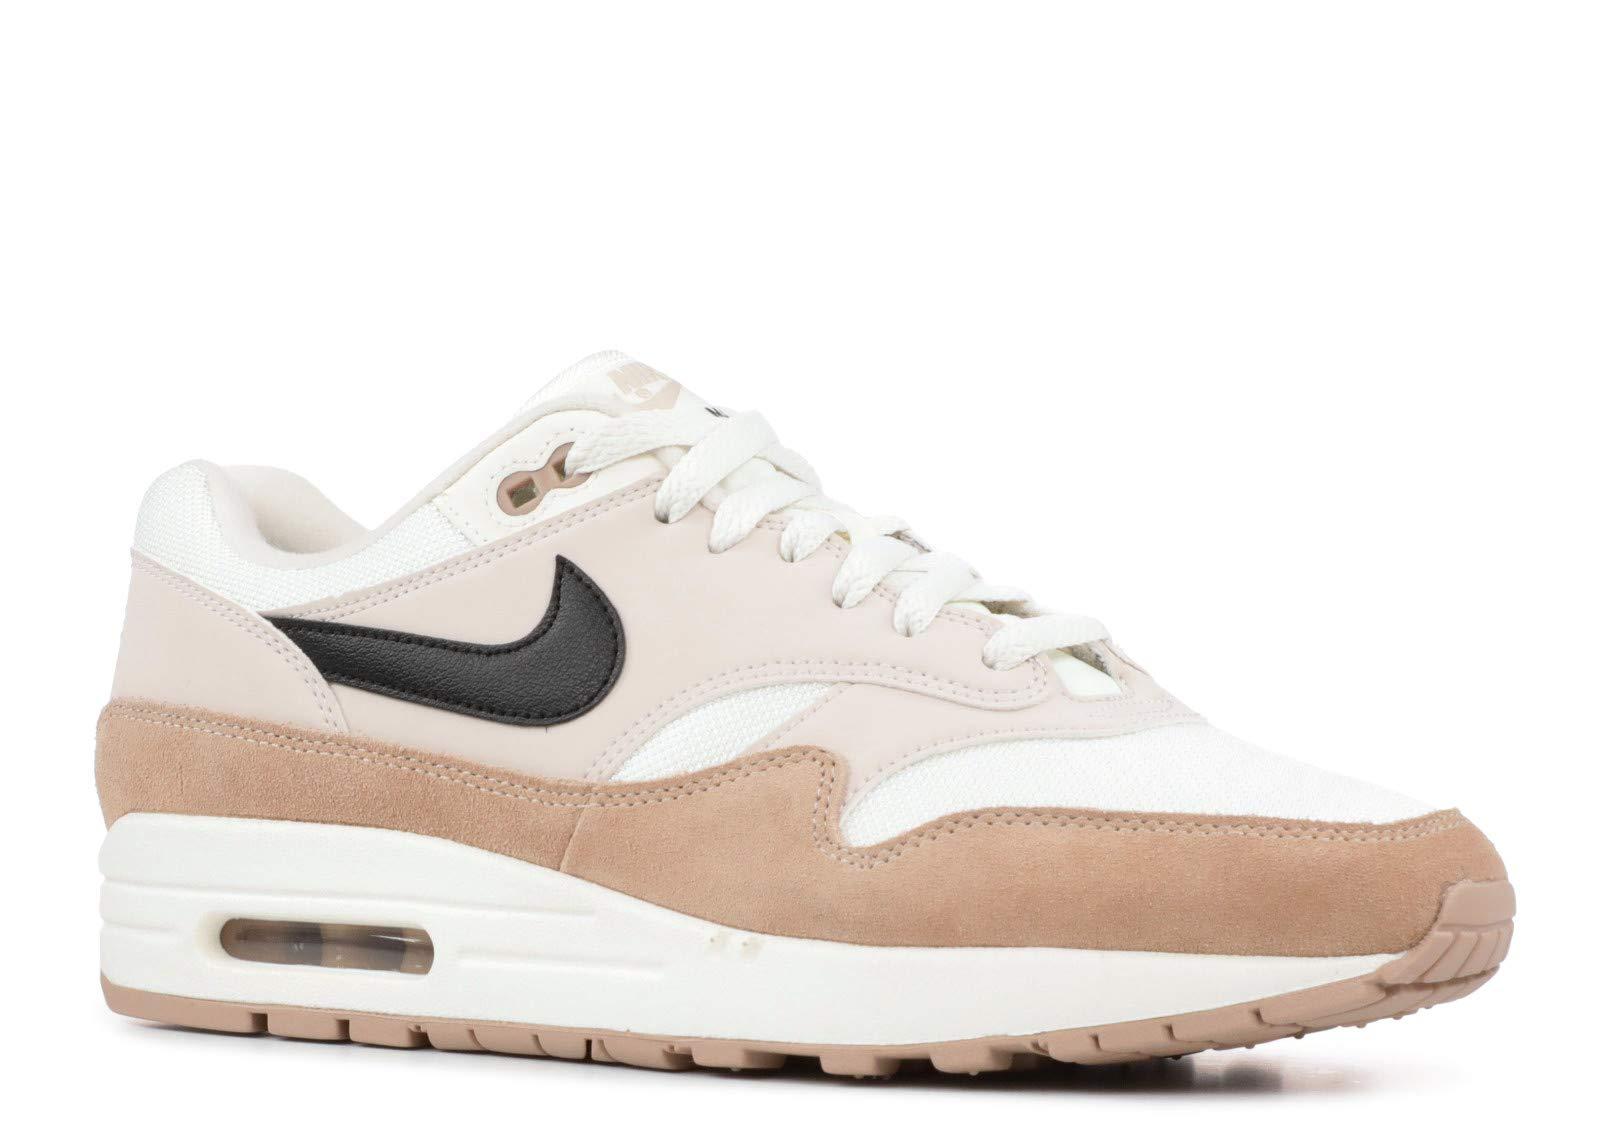 352fbc2551 Galleon - Nike Air Max 1 Mens Trainers AH8145 Sneakers Shoes (UK 6 US 7 EU  40, Sand Black Desert 200)